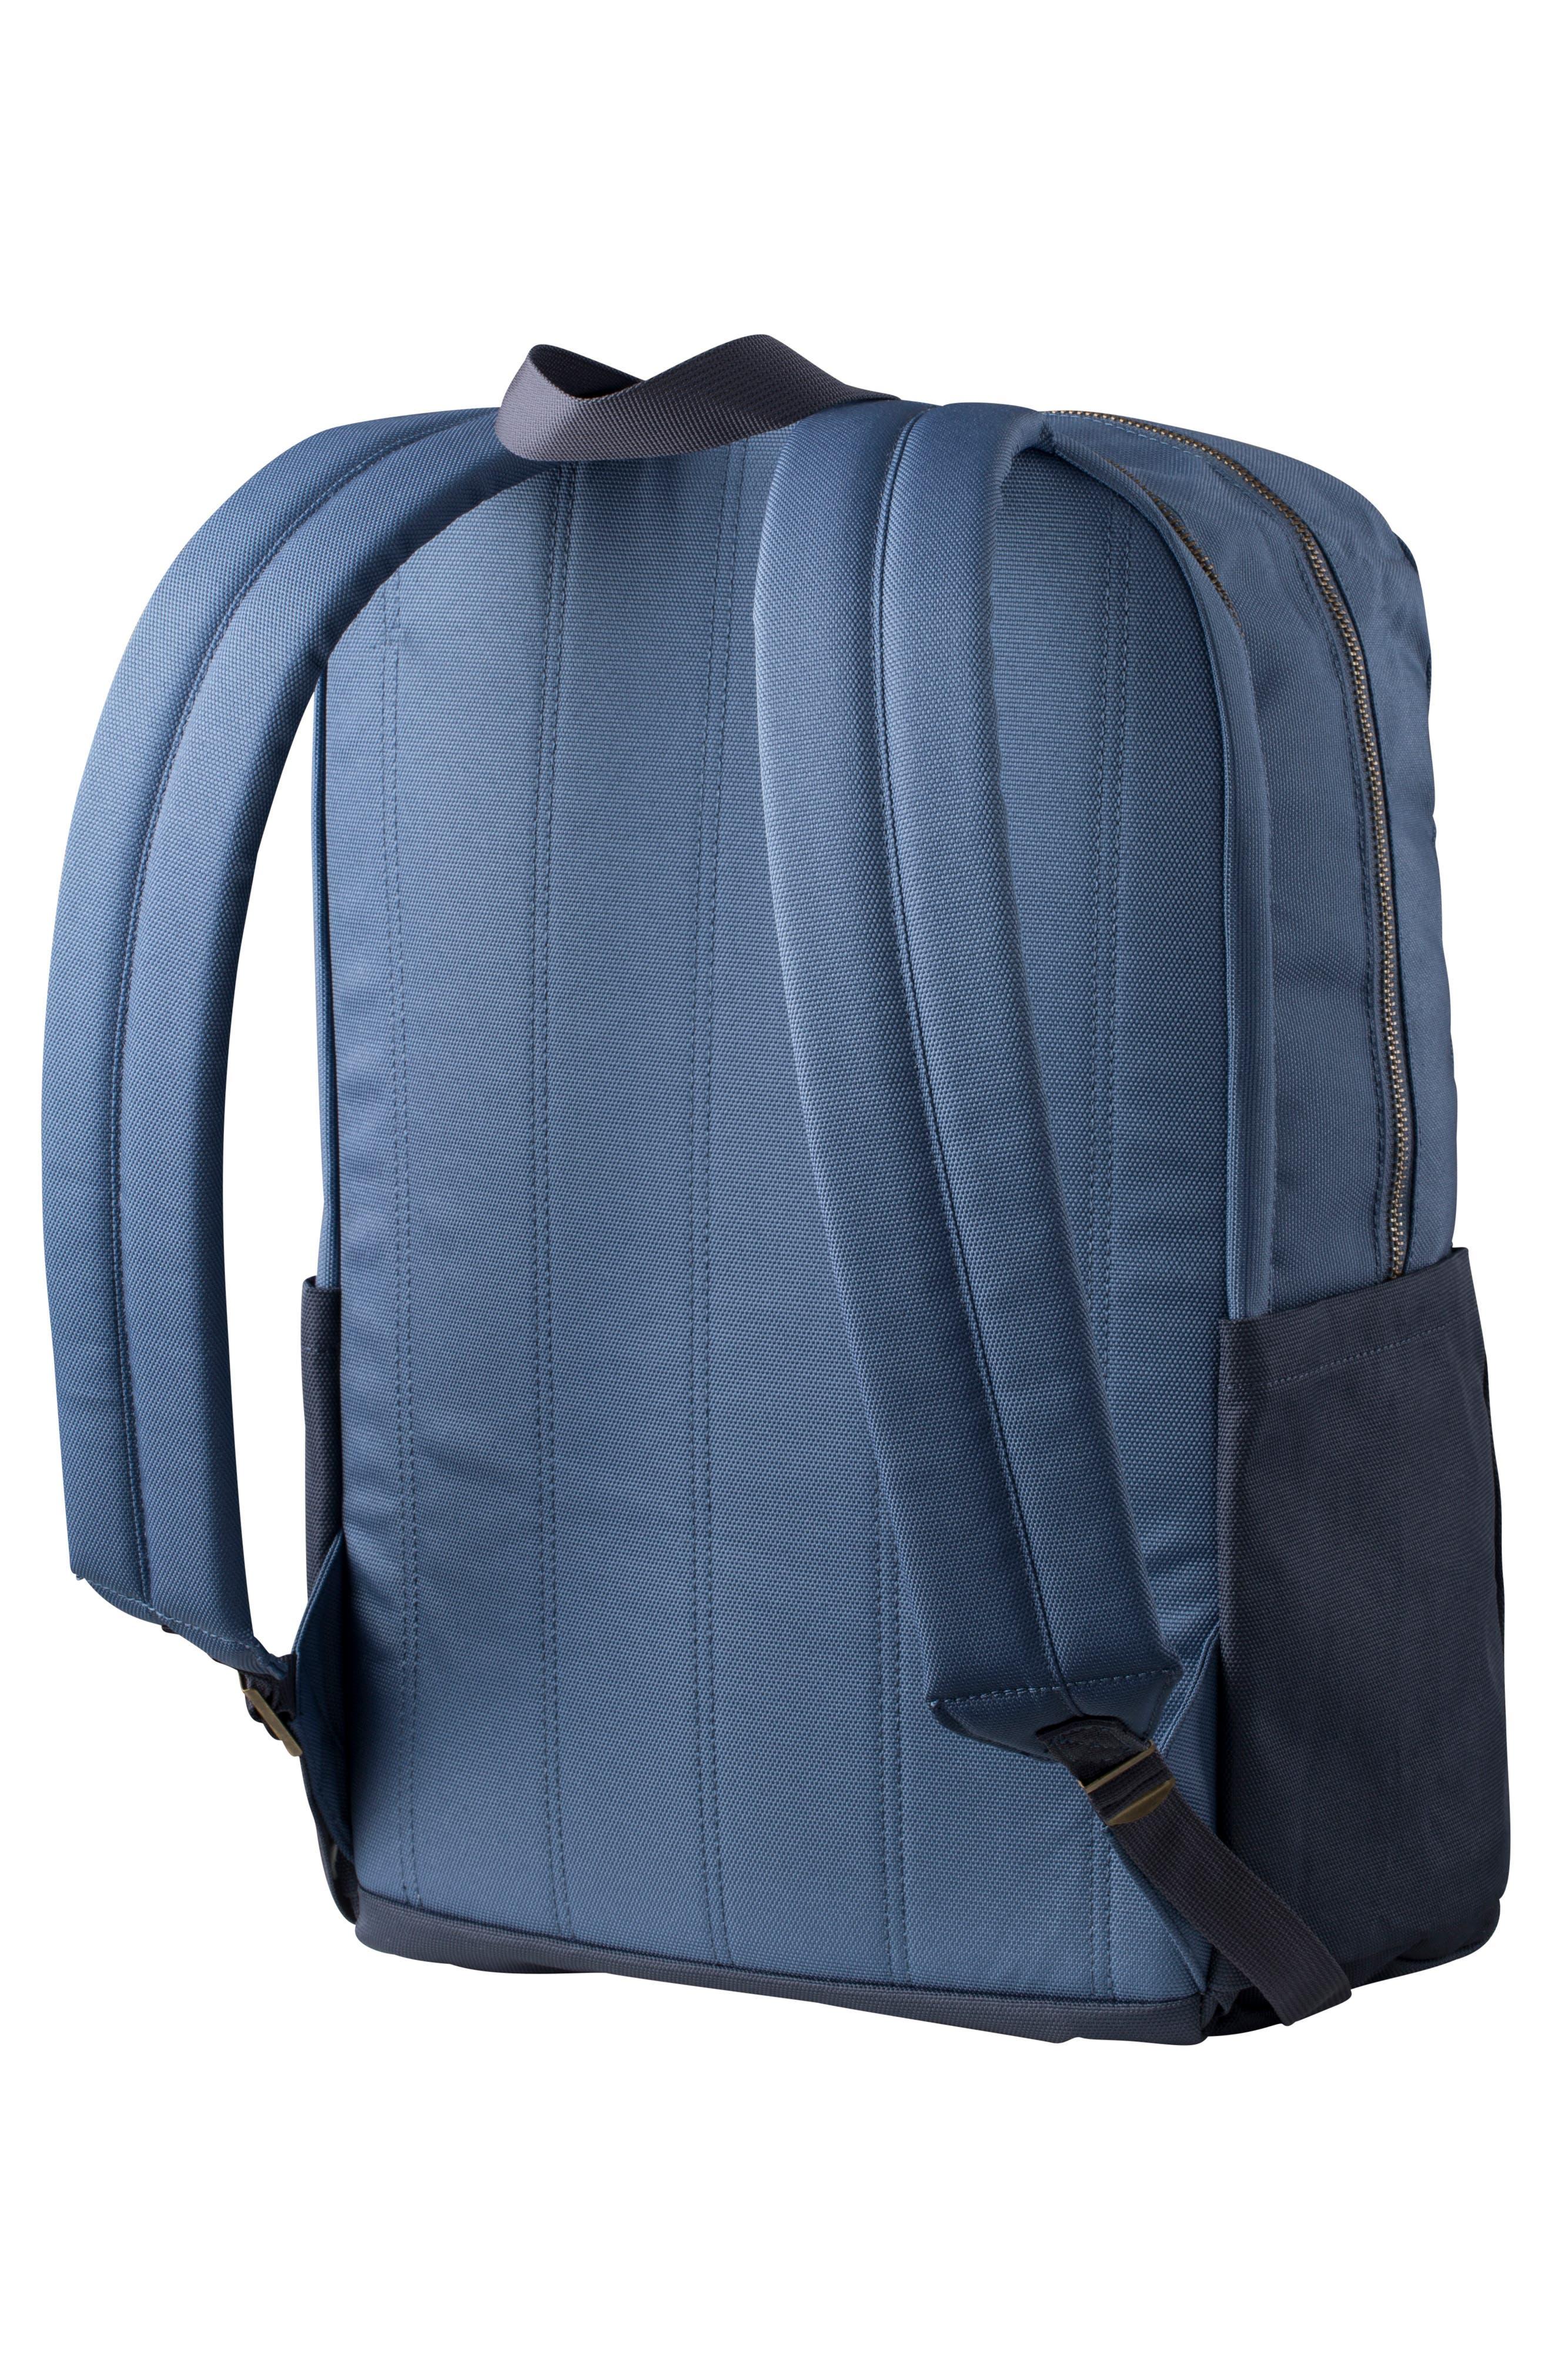 Bergen Backpack,                             Alternate thumbnail 2, color,                             GRAPHITE BLUE